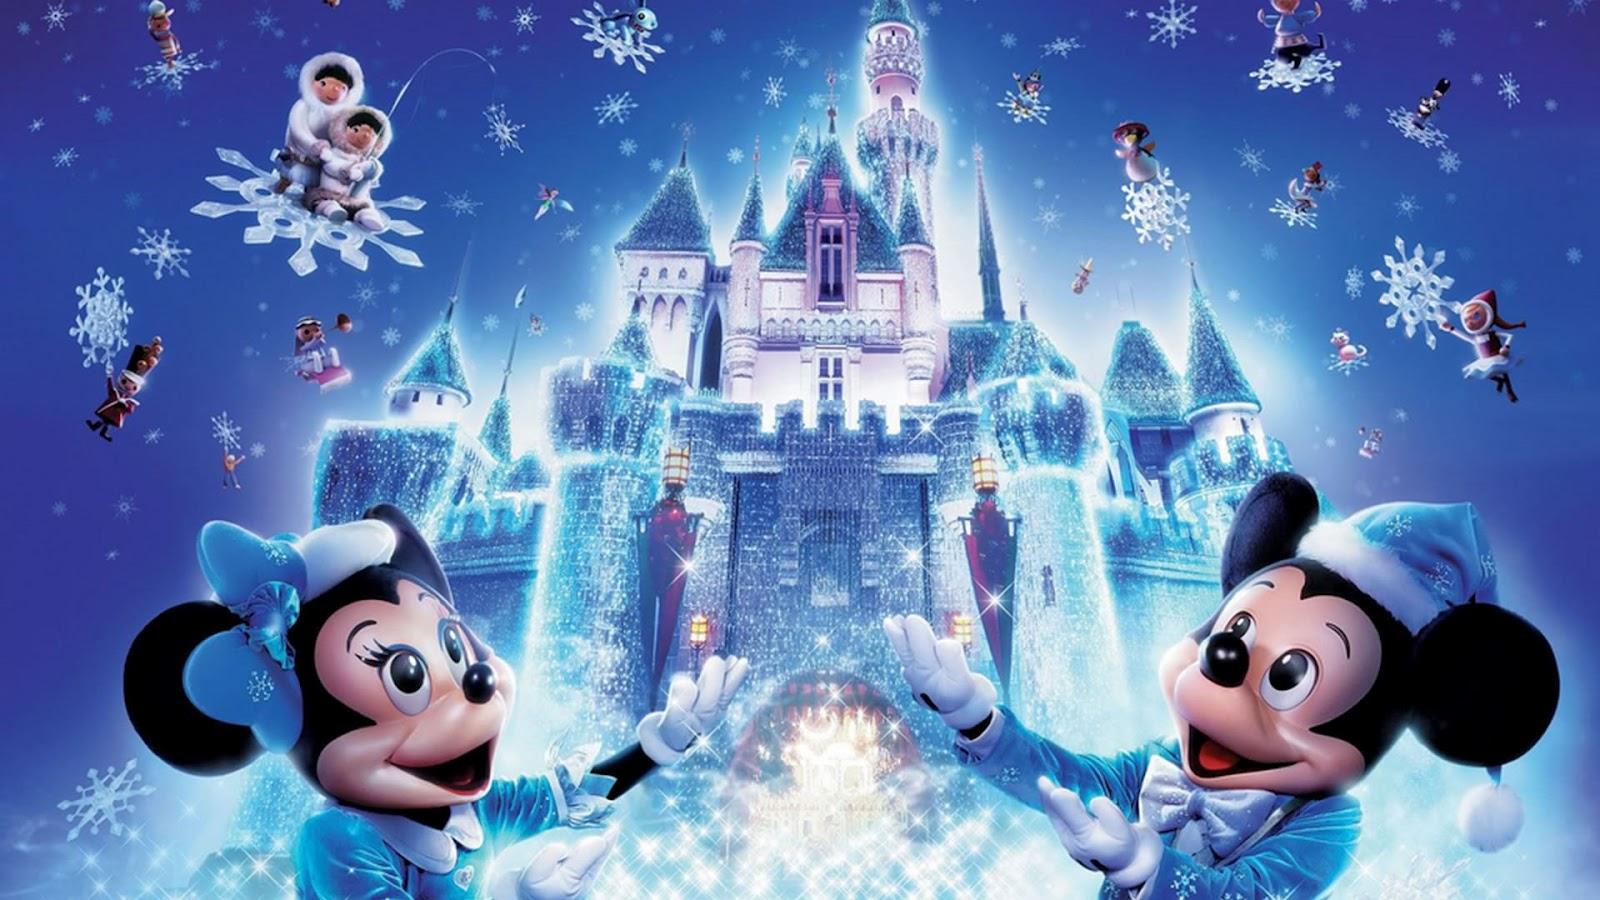 wallpaper Hd Wallpaper Disney World 1600x900